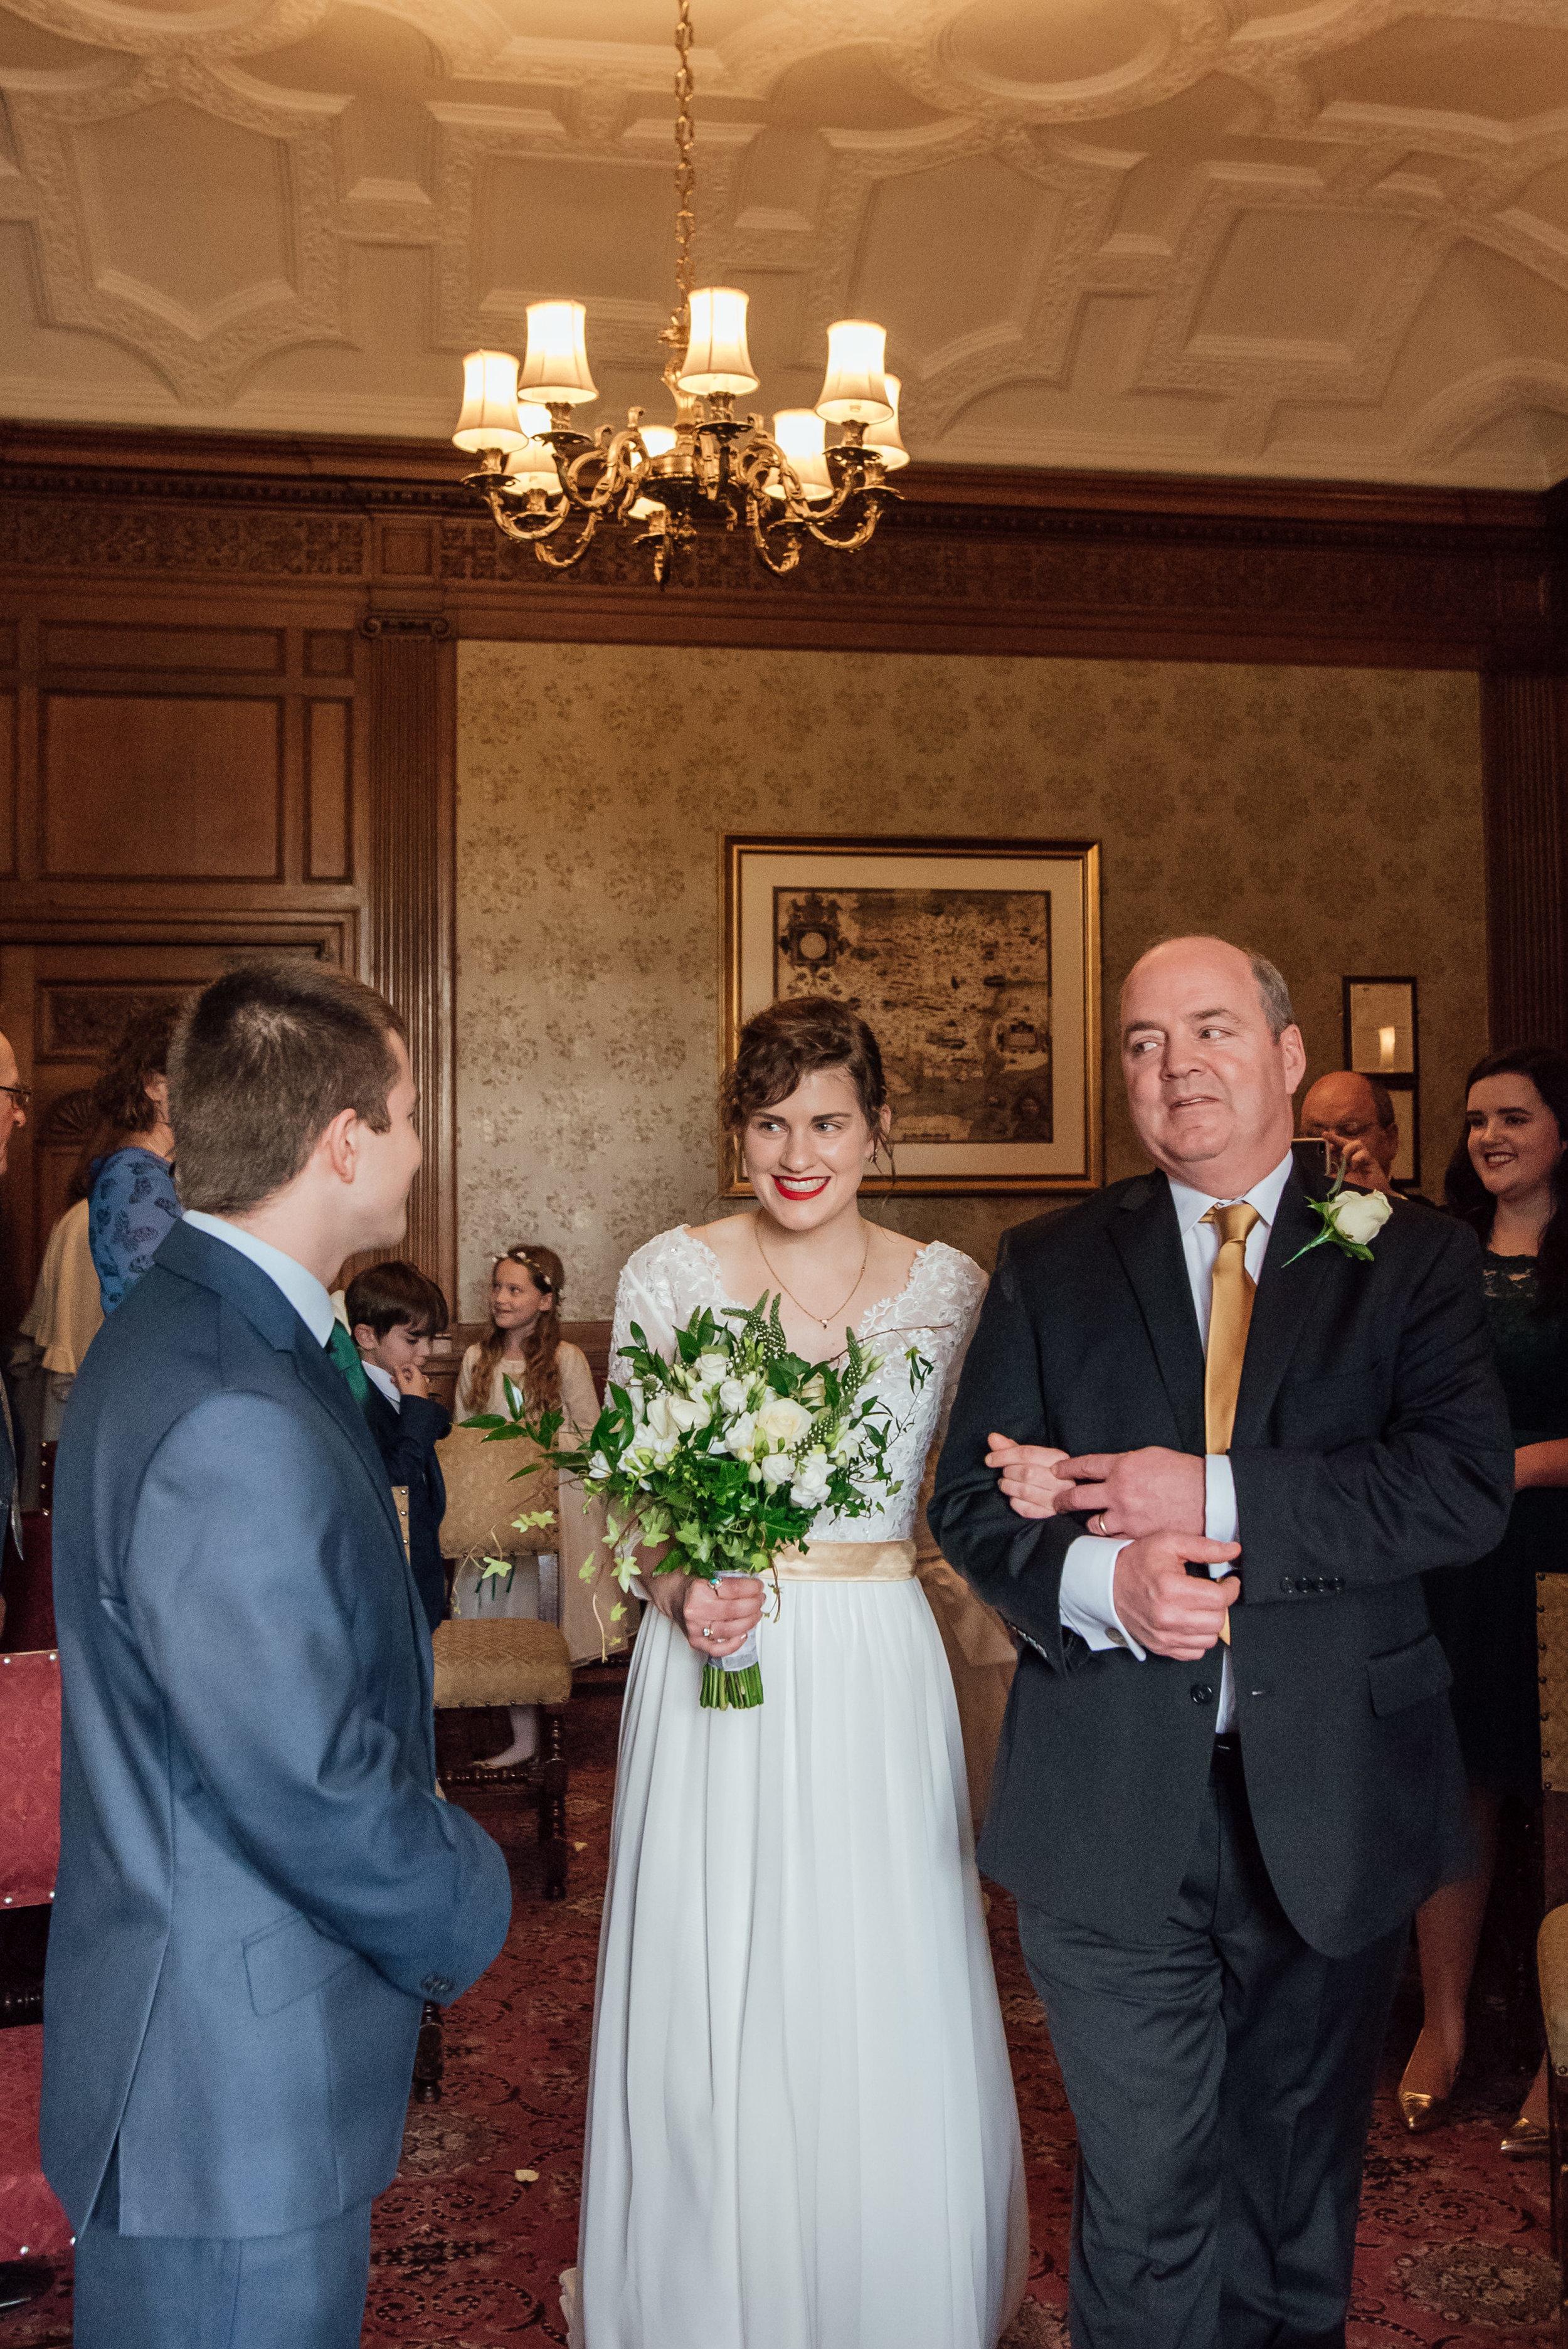 Hampshire-wedding-photographer-hampshire : Amy-James-Photography : Tylney-Hall-Wedding : Tyleny-Hall-Wedding-Photographer : Hampshire-wedding-venue : Fleet-wedding-photographer-farnborough-318.jpg